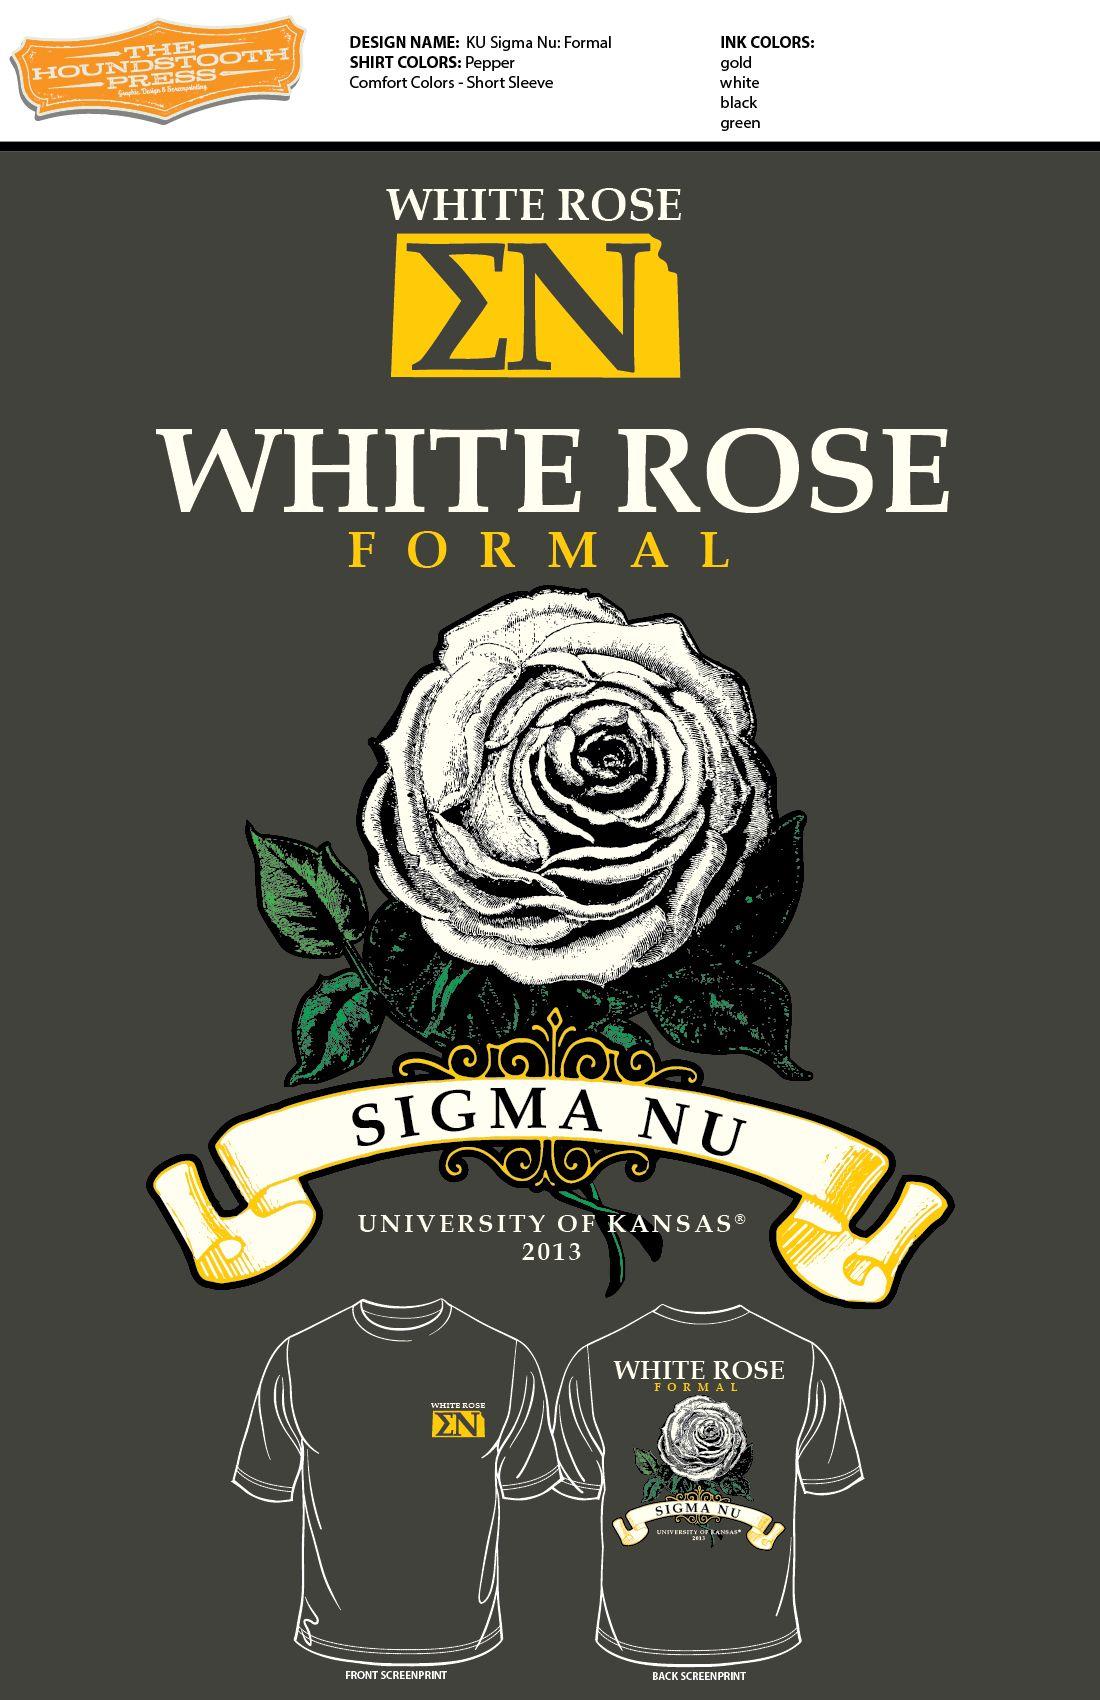 T shirt printing at white rose - University Of Arkansas Sigma Nu White Rose Formal 2013 Comfort Colors T Shirt Lovethelab